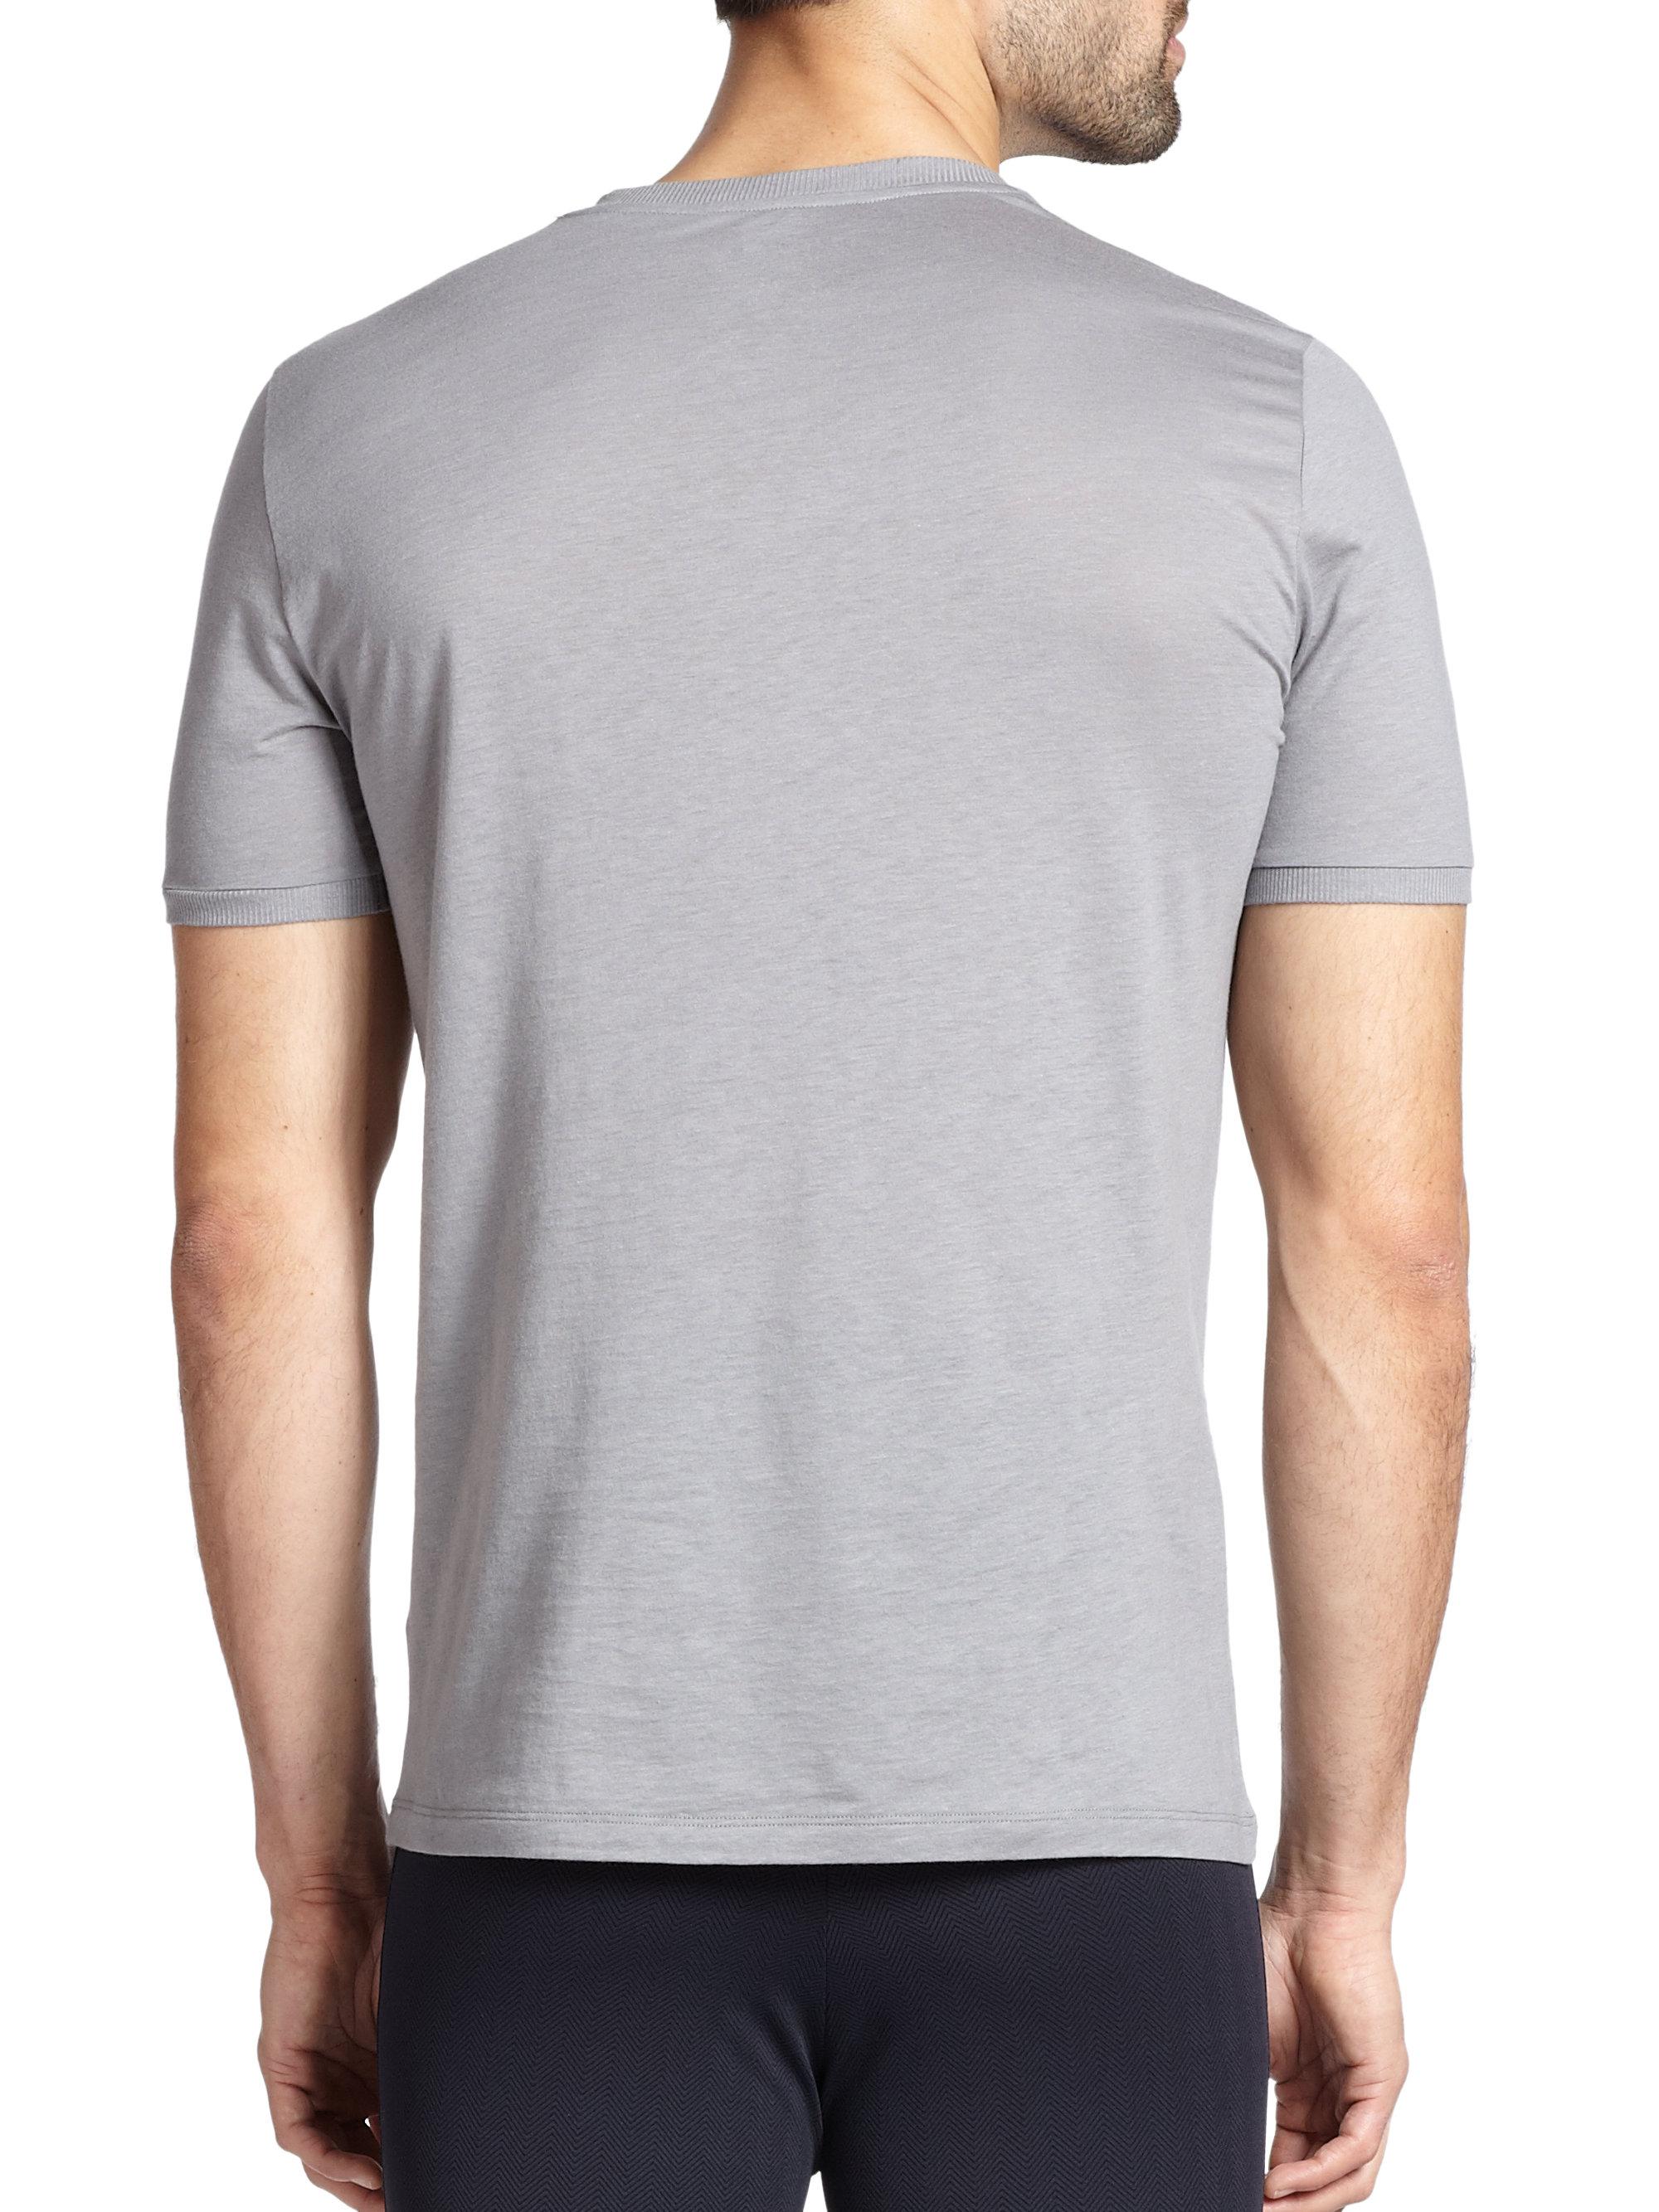 La perla silk cotton v neck tee in gray for men lyst for Cotton silk tee shirts